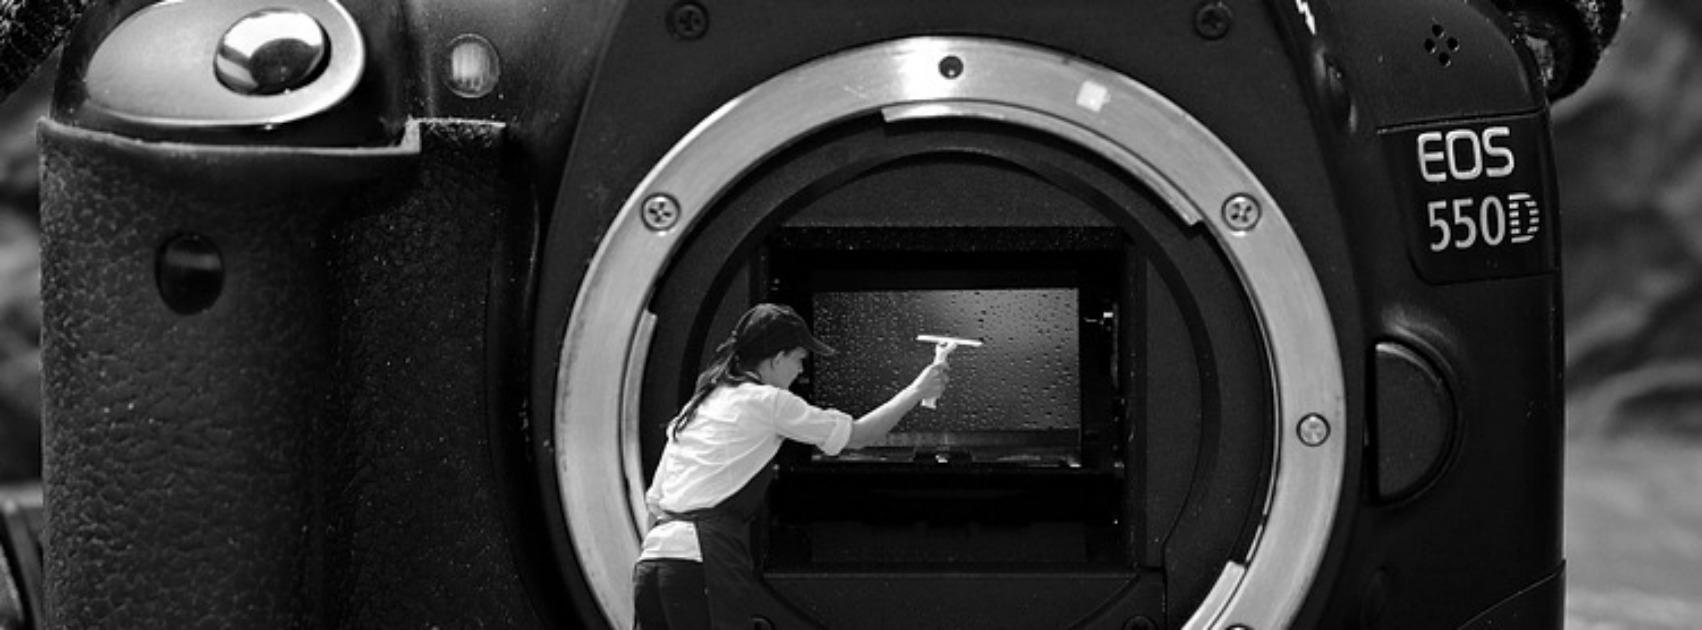 Frau putzt Objektiv